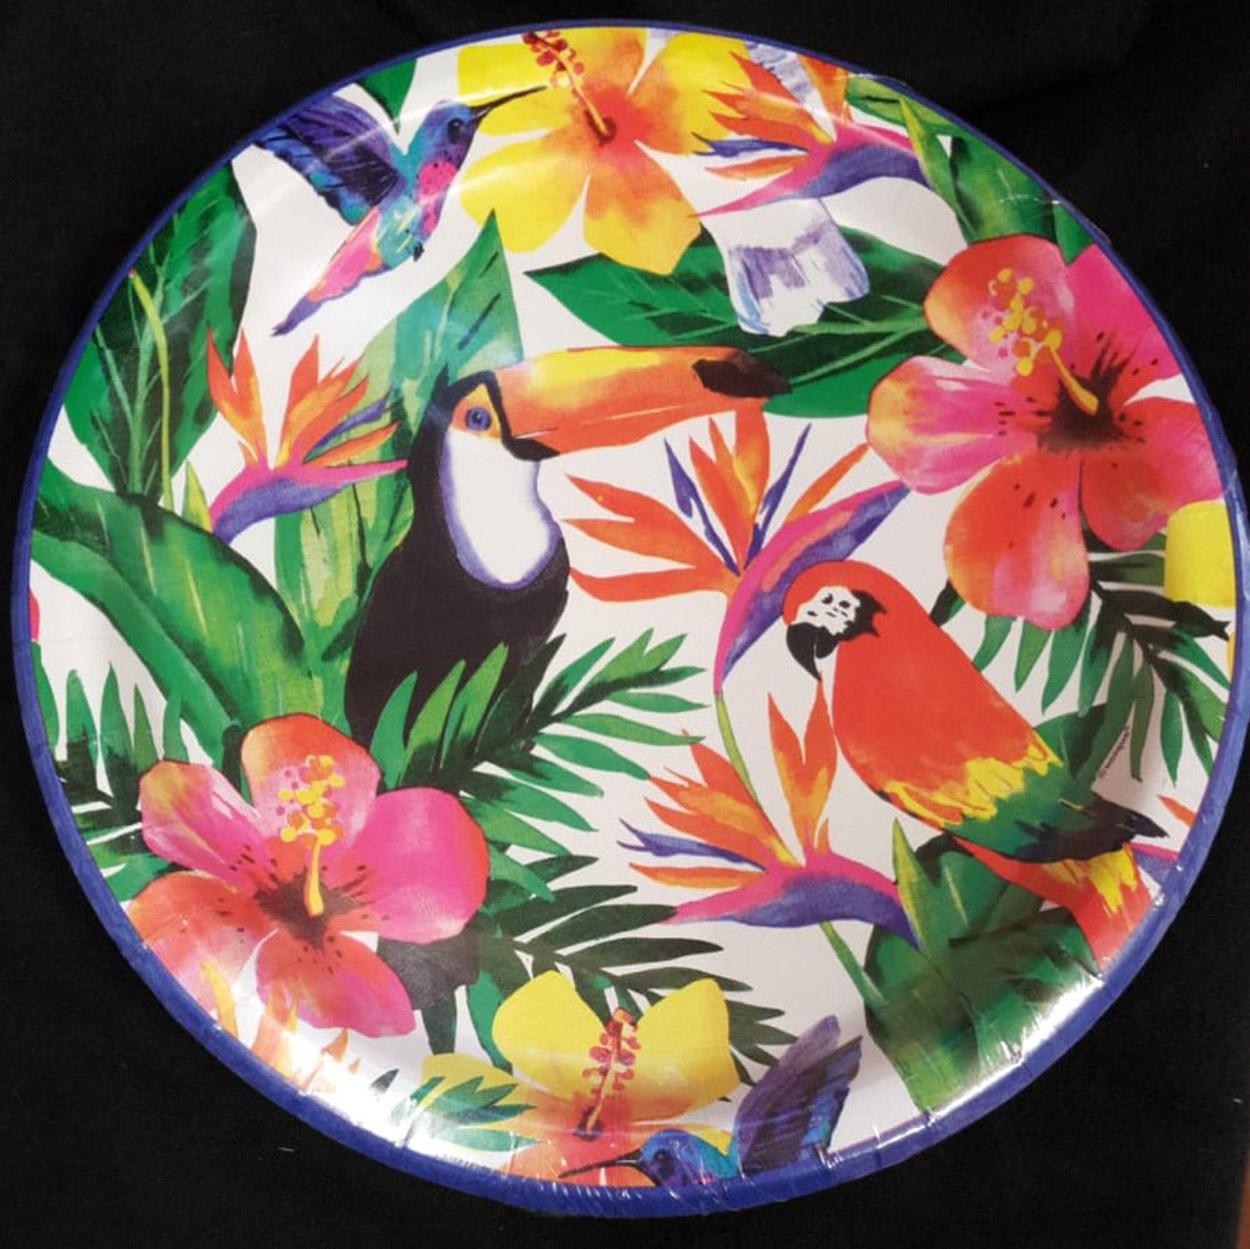 fc2152749ef9 8 Tropical Birds Toucan Parrot Paper Plates Hawaiian Palm Leaf Party Plate  23cm